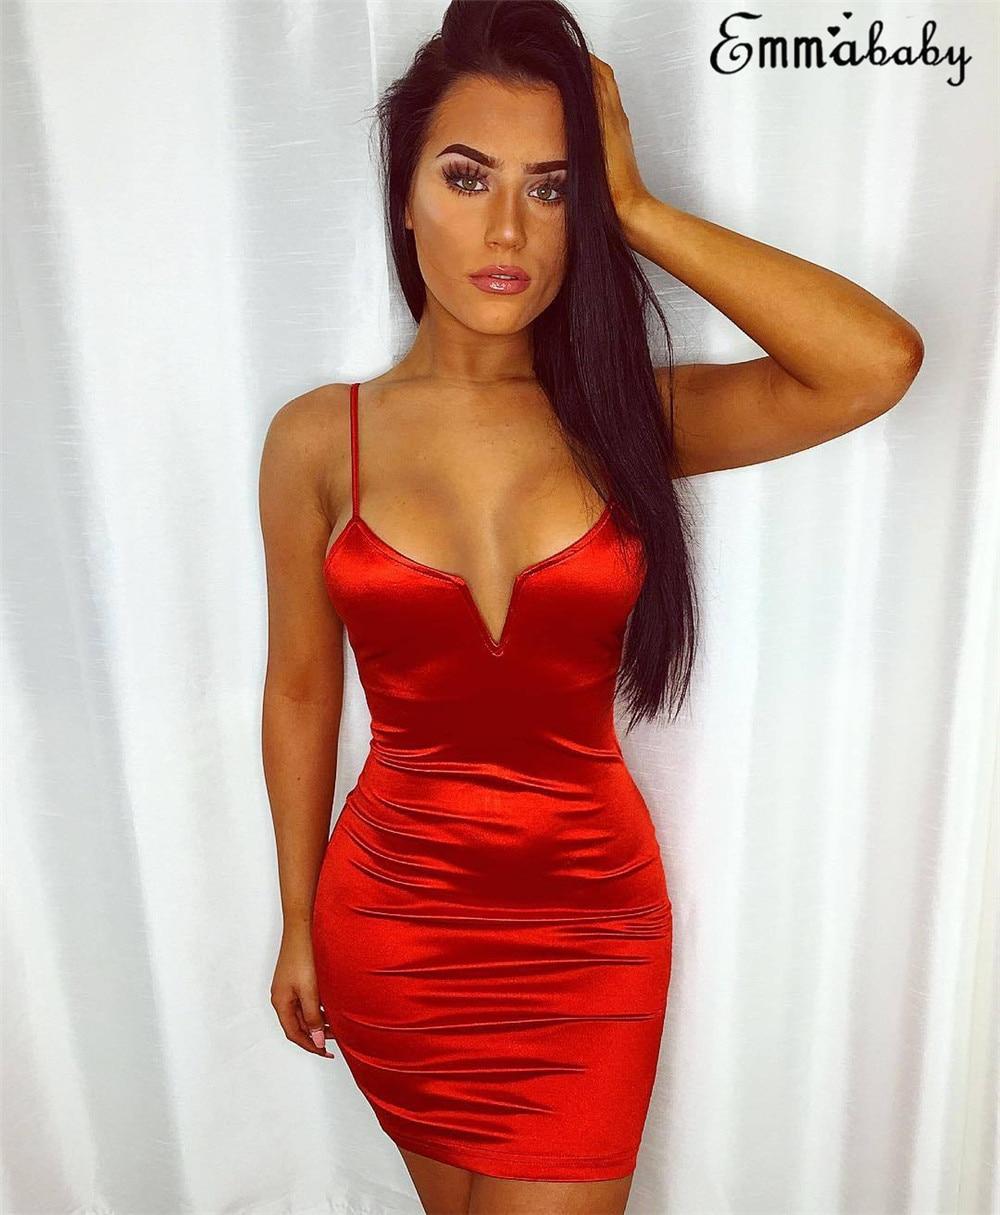 Sexy Red Dress Short Female Sleeveless V-neck Bodycon Spaghetti Strap Mini Dresses Woman Party Night Summer Dress